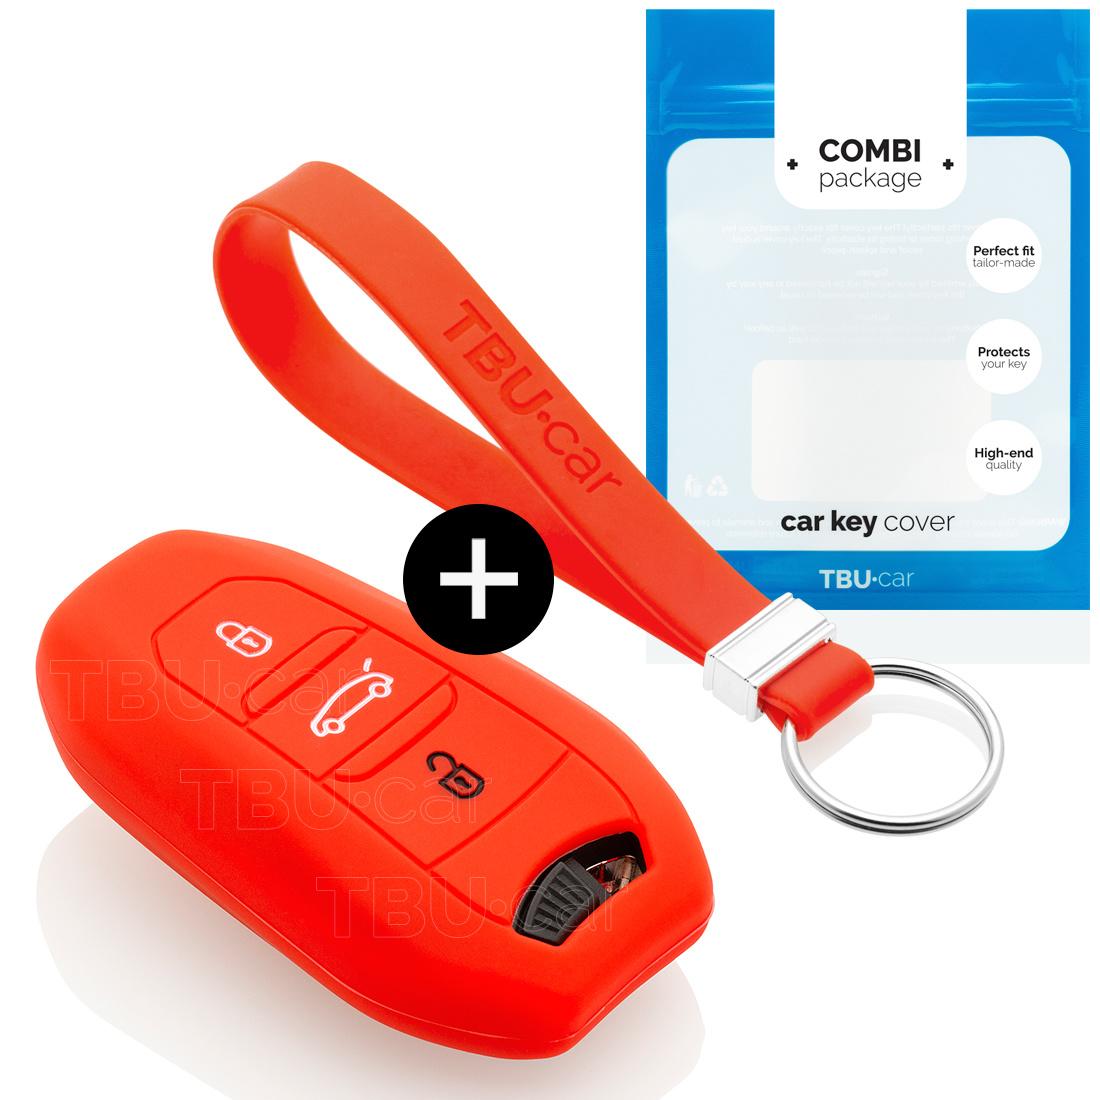 TBU car Autoschlüssel Hülle für Peugeot 3 Tasten (Keyless Entry) - Schutzhülle aus Silikon - Auto Schlüsselhülle Cover in Rot